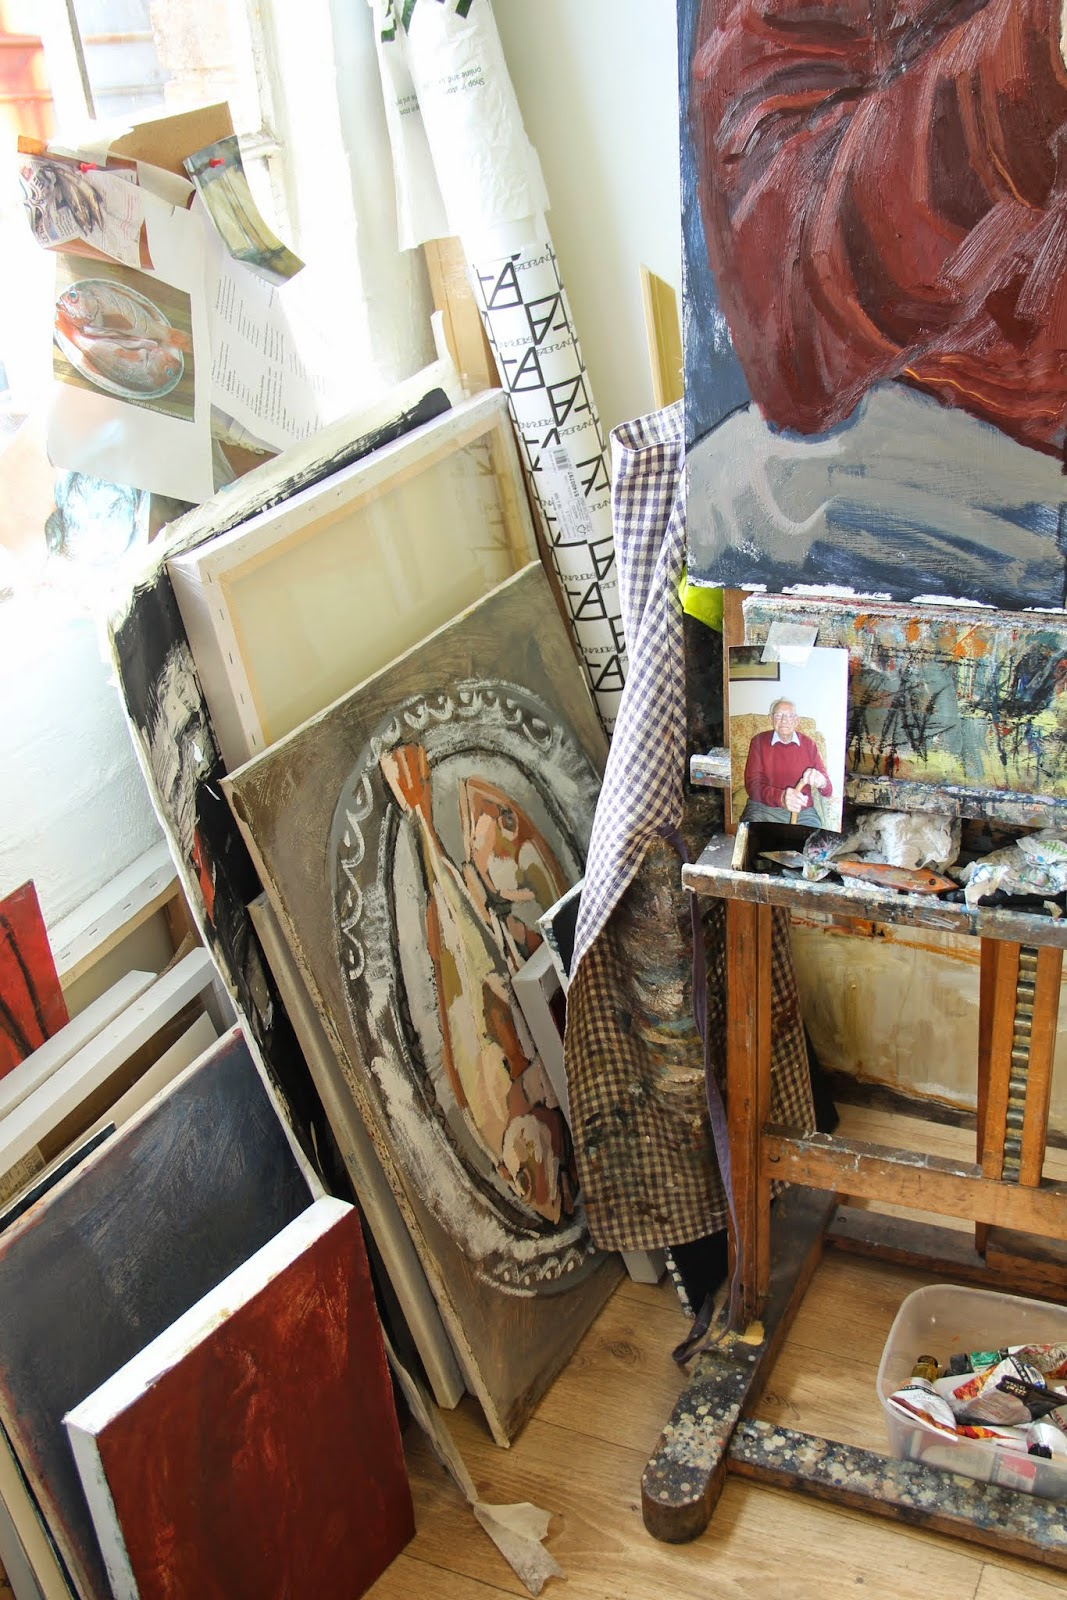 jane hooper artist, commercial square studios, trend daily blog, caroline davis